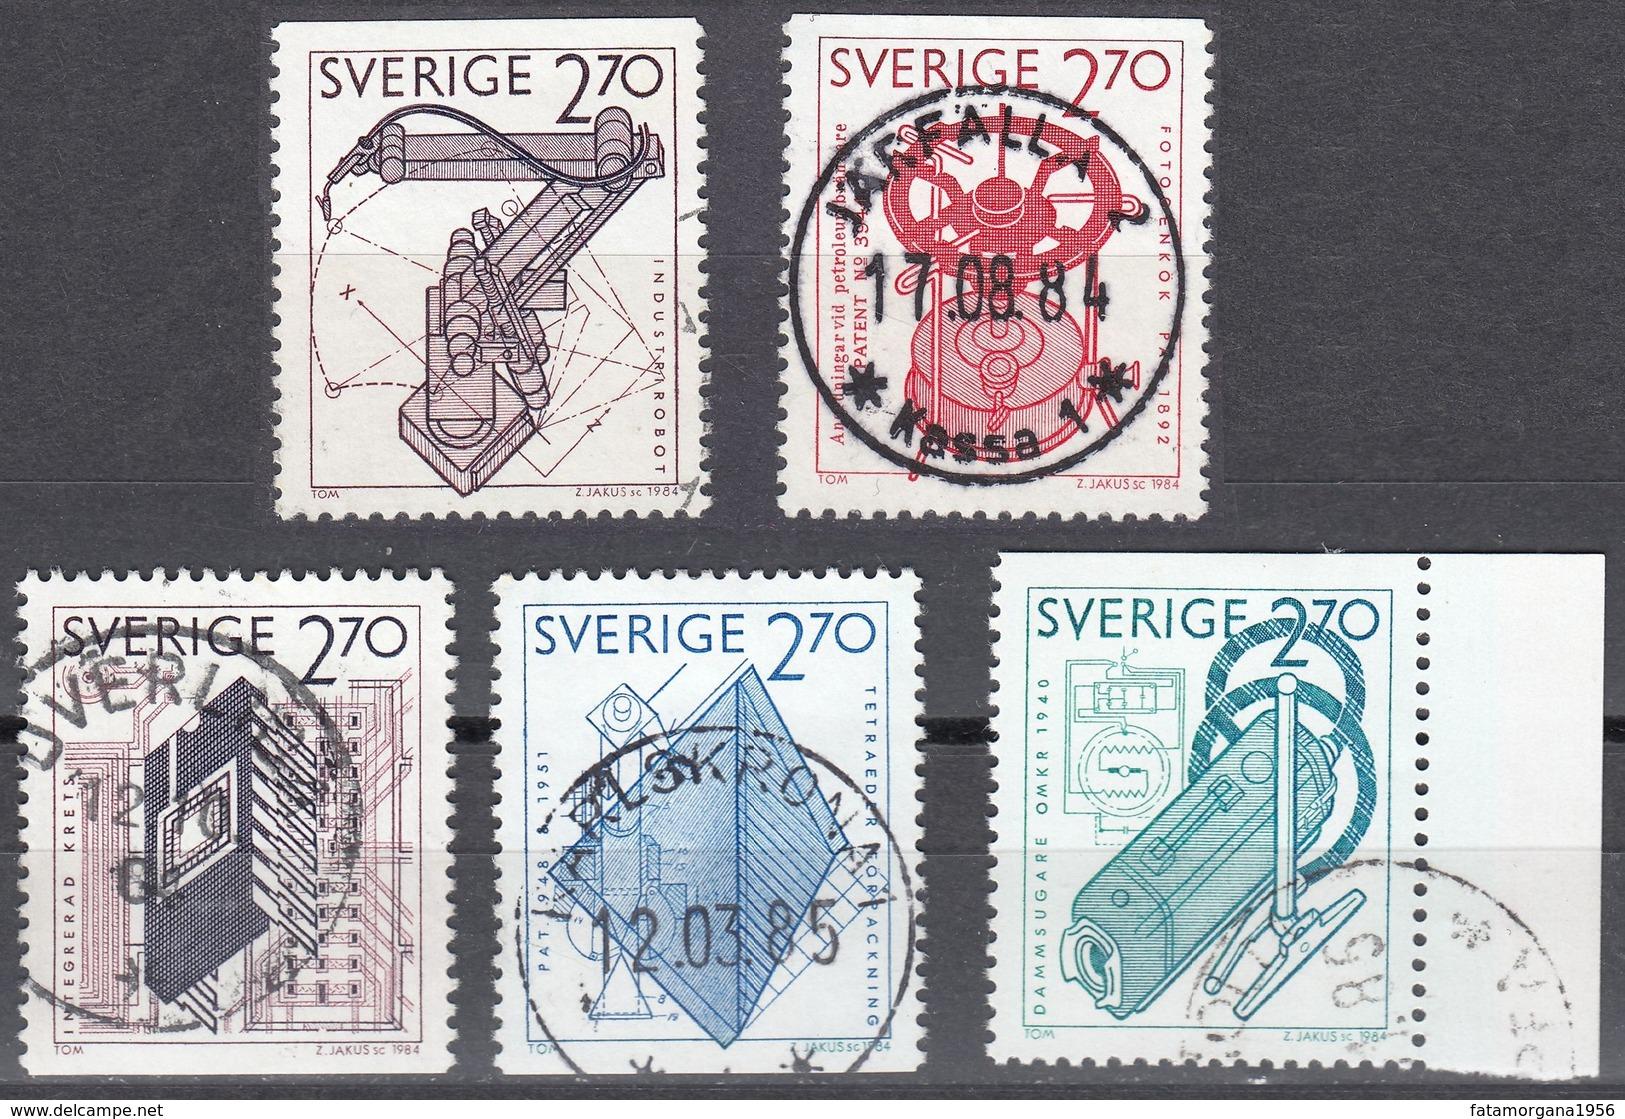 SVERIGE - SVEZIA - SWEDEN - 1984 - Lotto 5 Valori Obliterati: Yvert 1264, 1265, 1266, 1268 E 1269. - Schweden